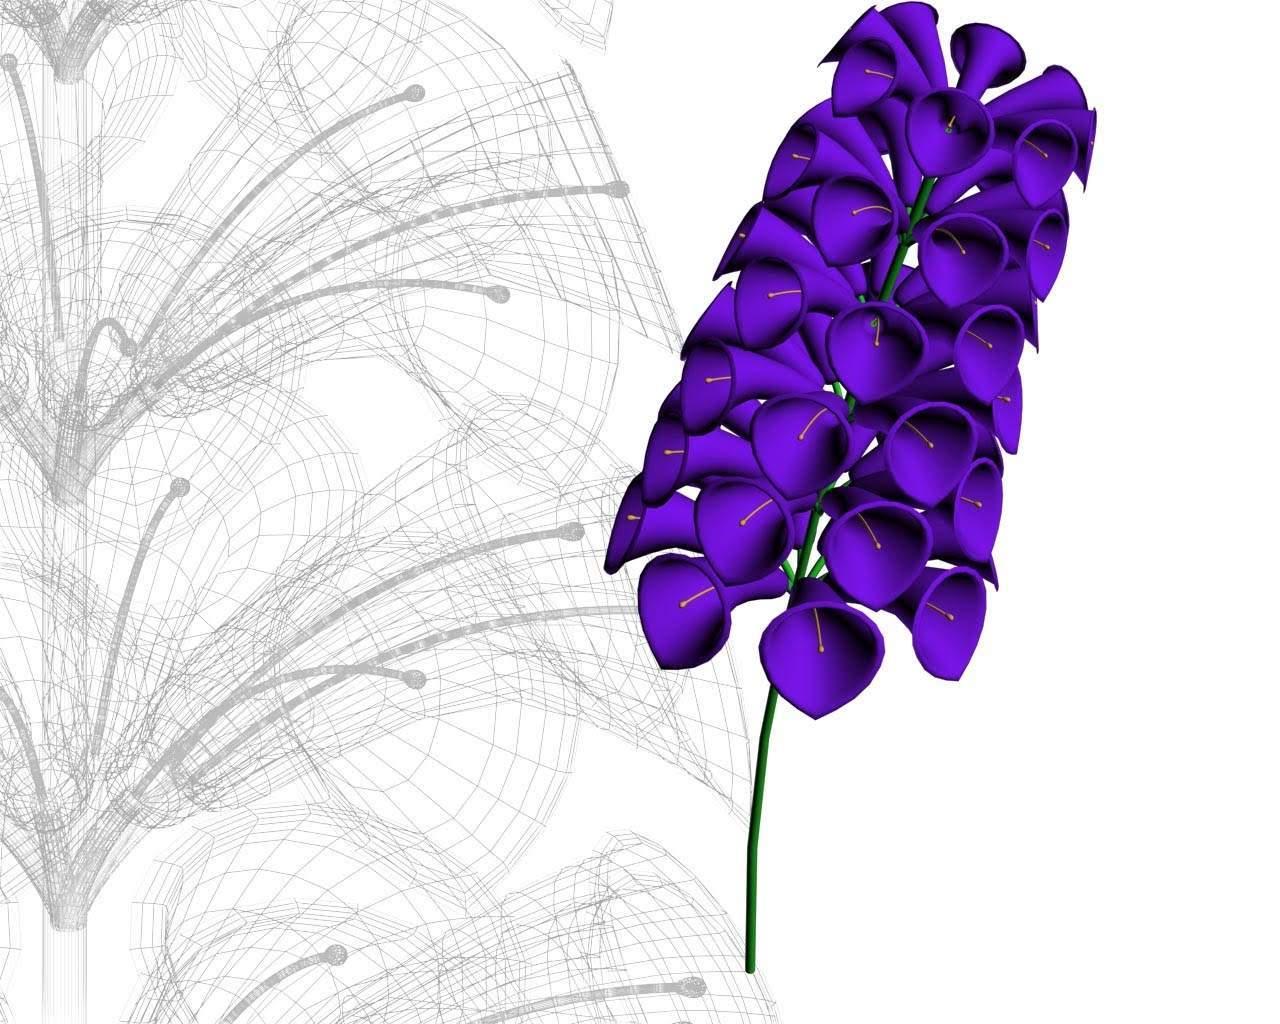 Gambar Bunga Mawar Putih Love Gambar Animasi Bunga